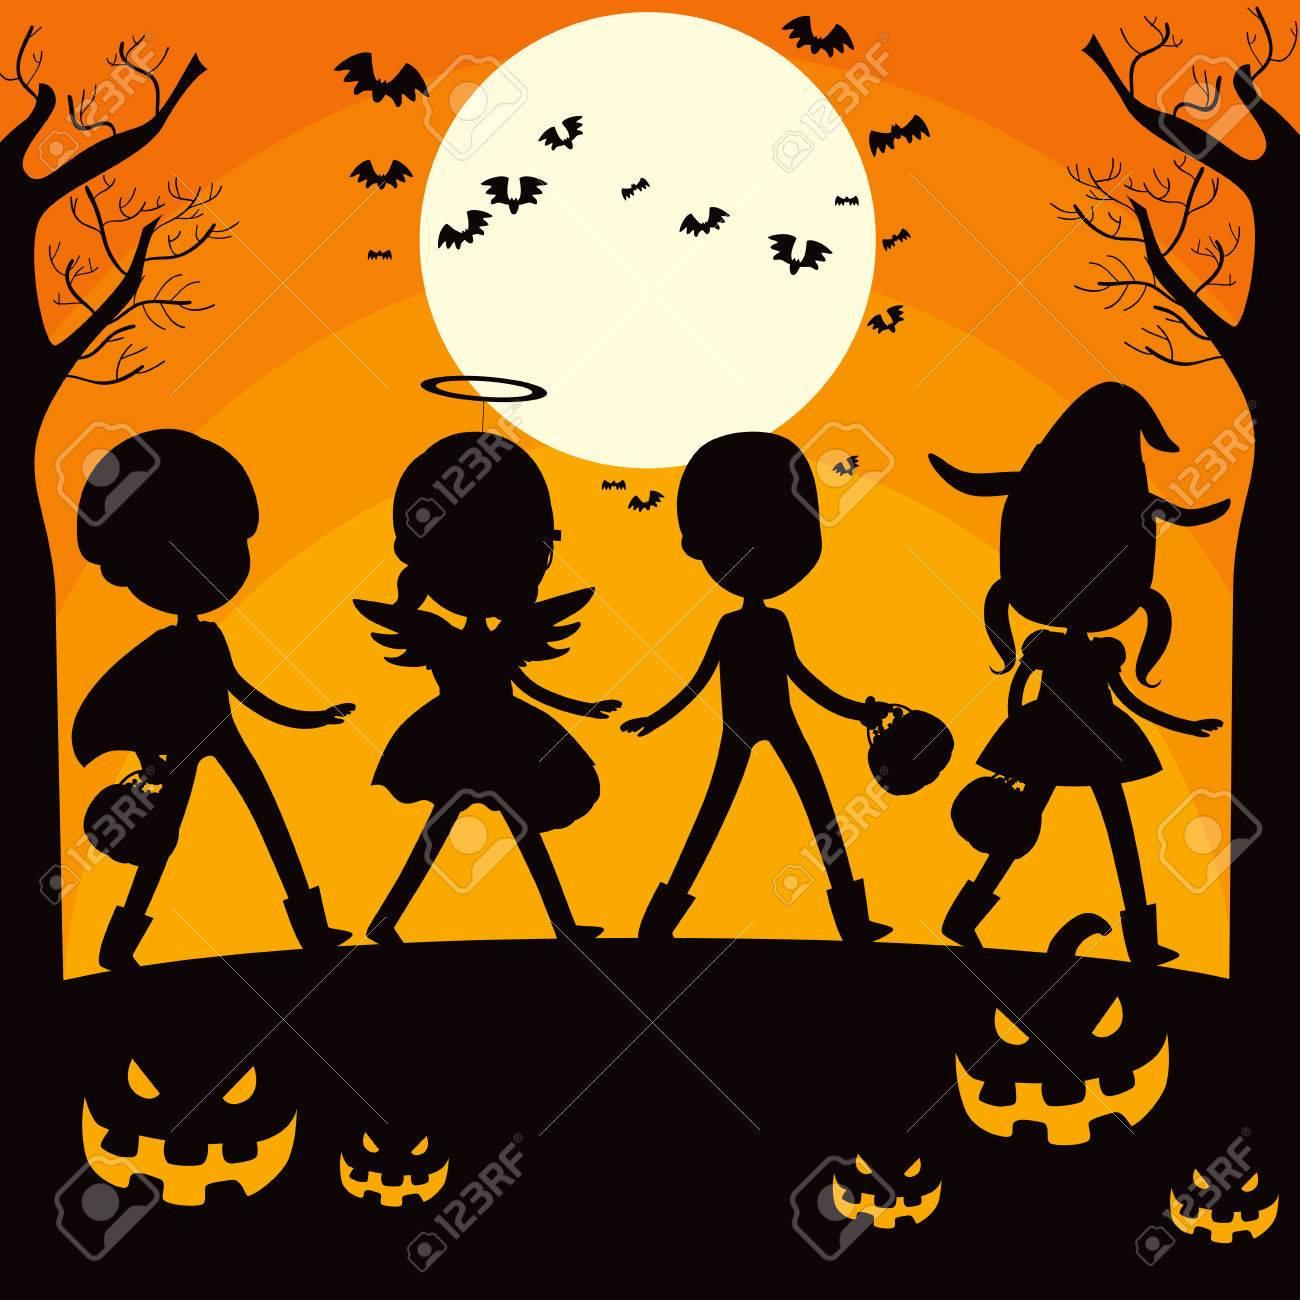 Halloween Trick Or Treat Silhouette.Children And Pumpkin Silhouette On Trick Or Treat Halloween Night